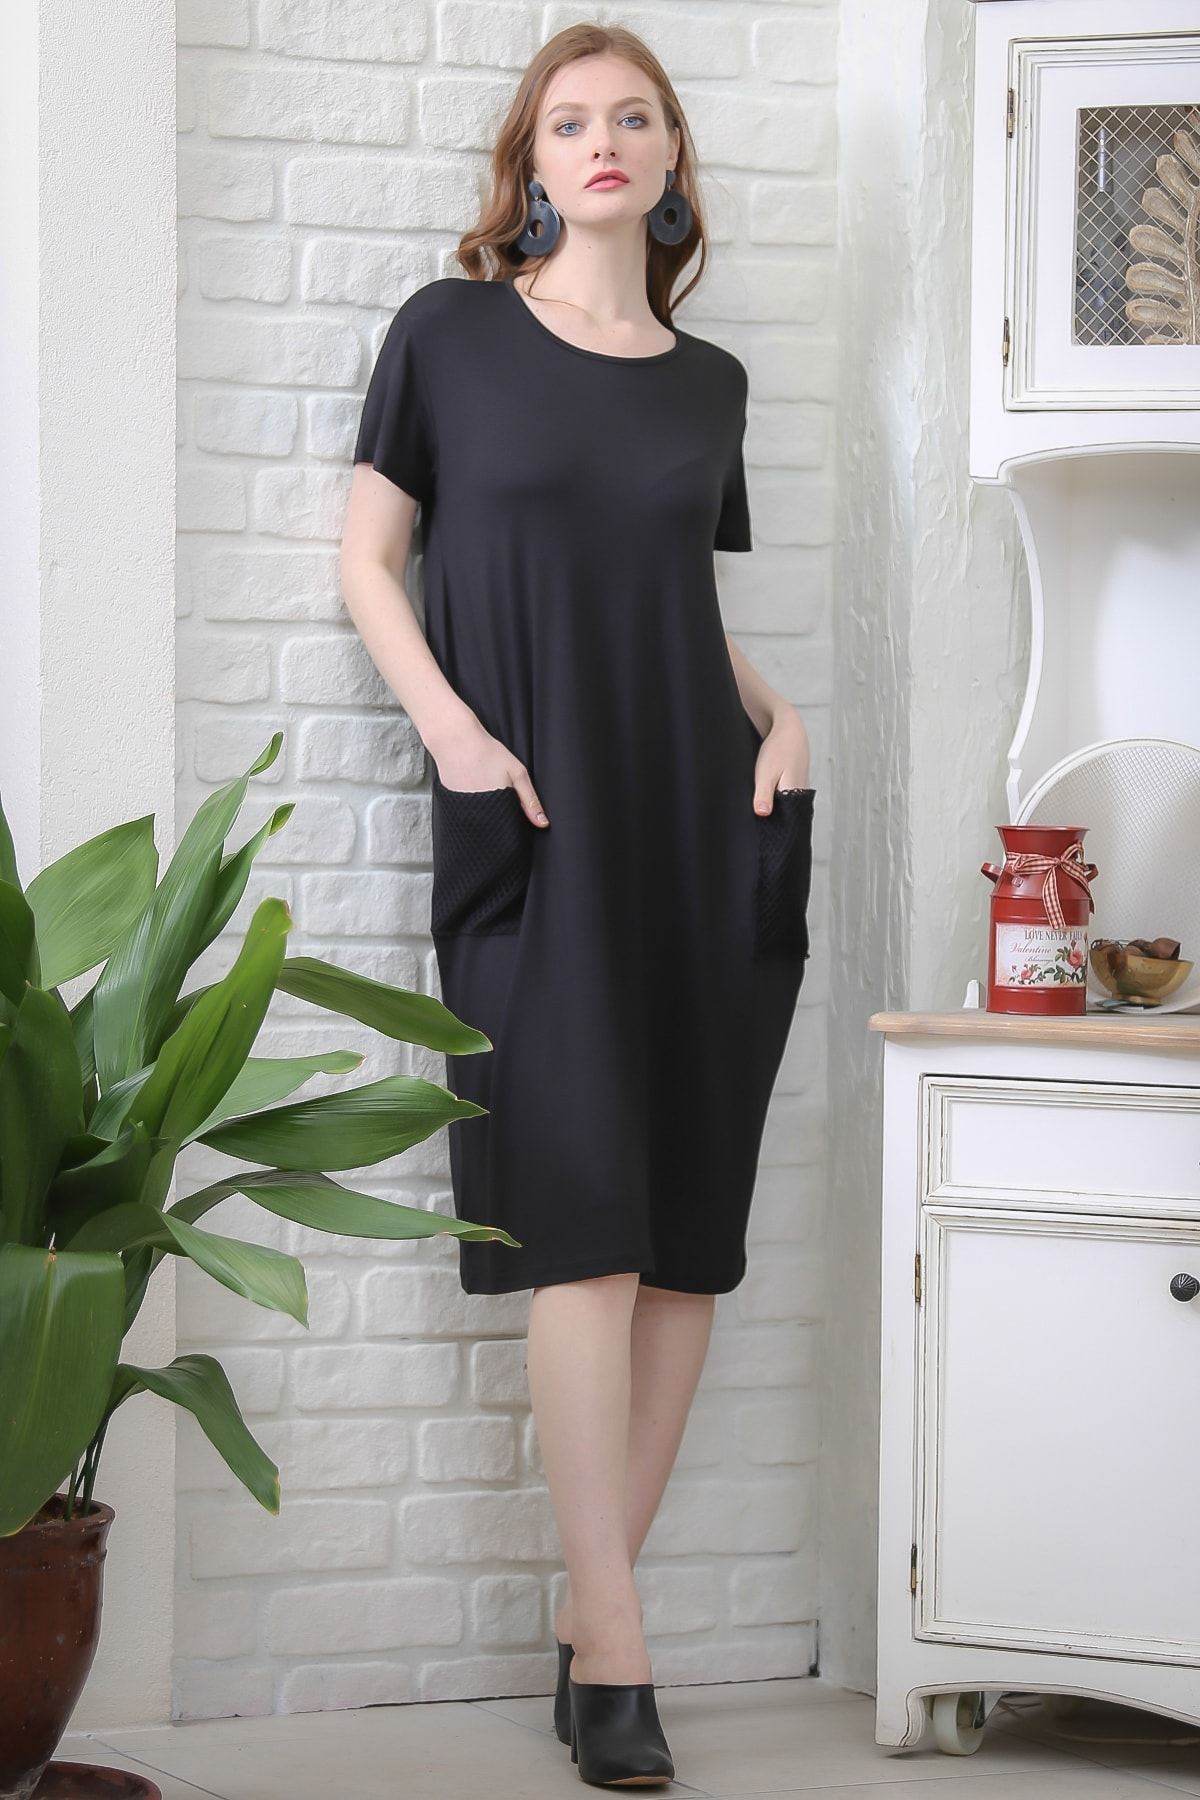 Chiccy Kadın Siyah Retro File Cep Detaylı Kısa Kollu Salaş Elbise M10160000EL97336 1